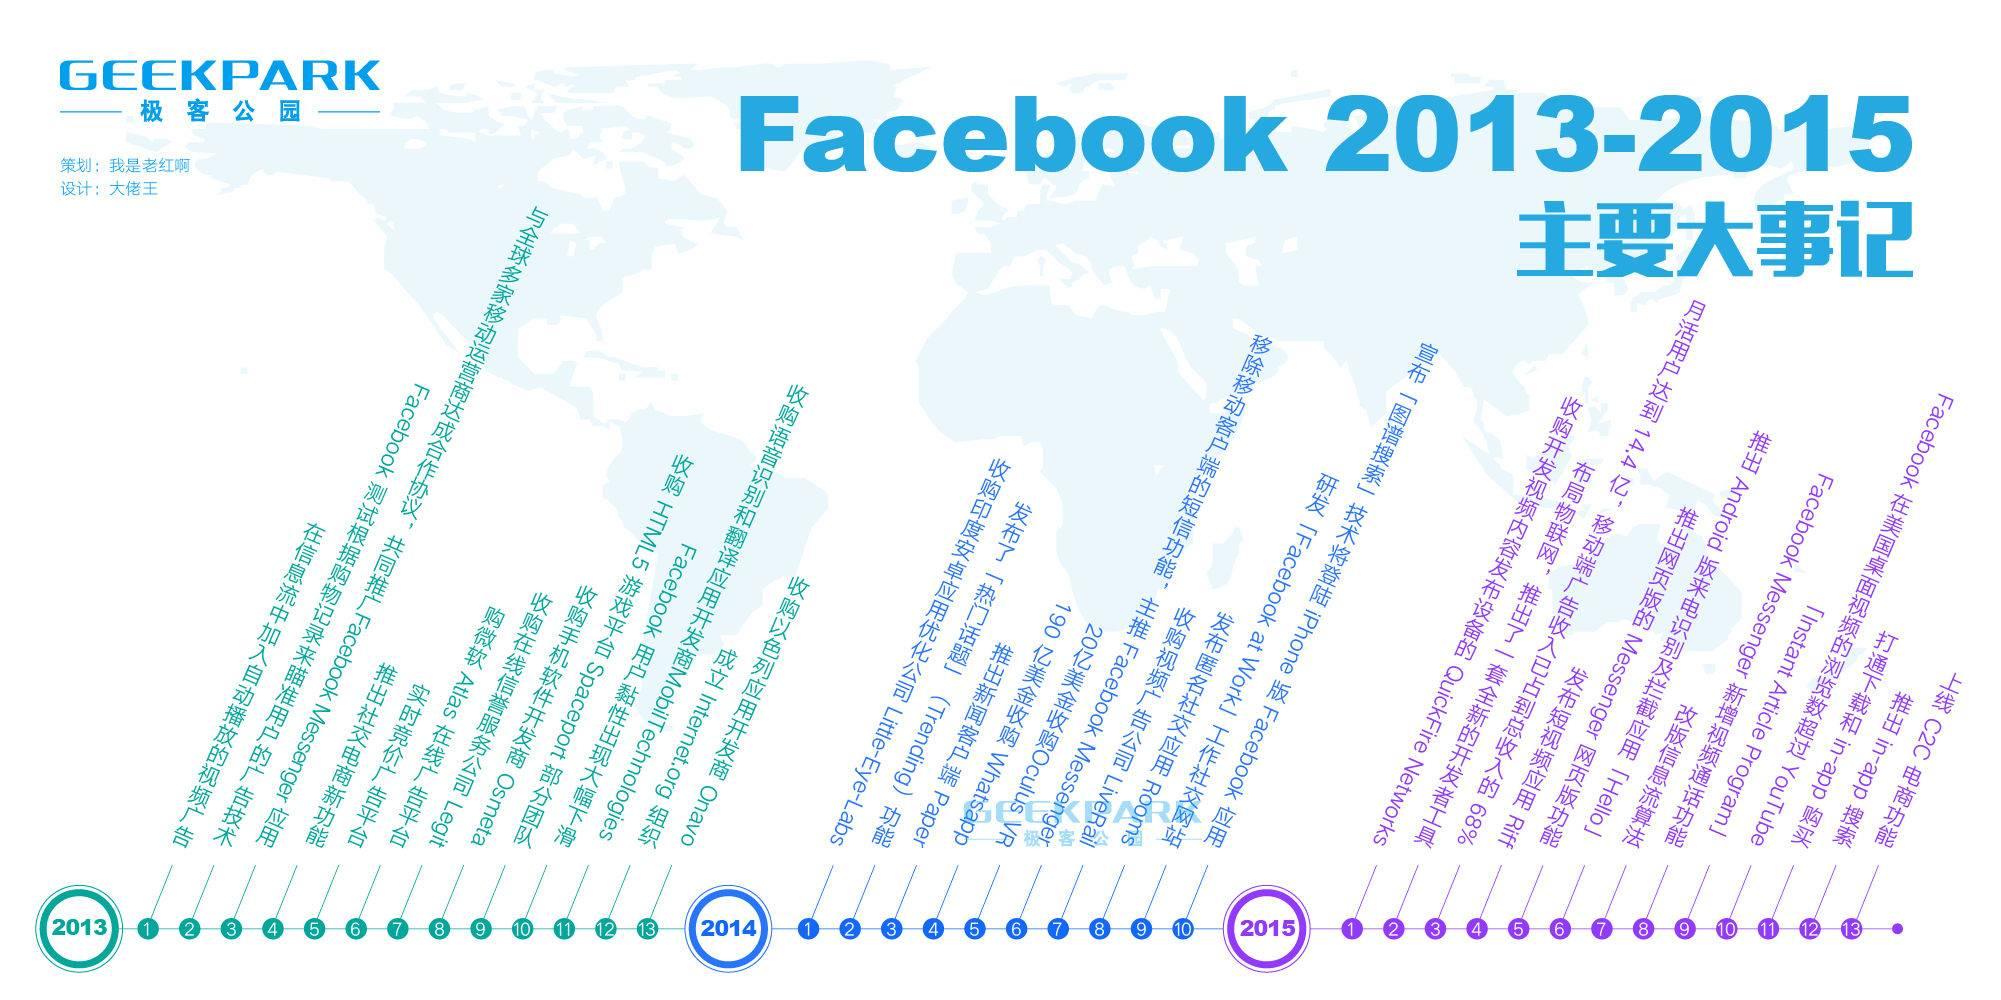 Facebook 2013-2015 主要大事记-水印.jpg